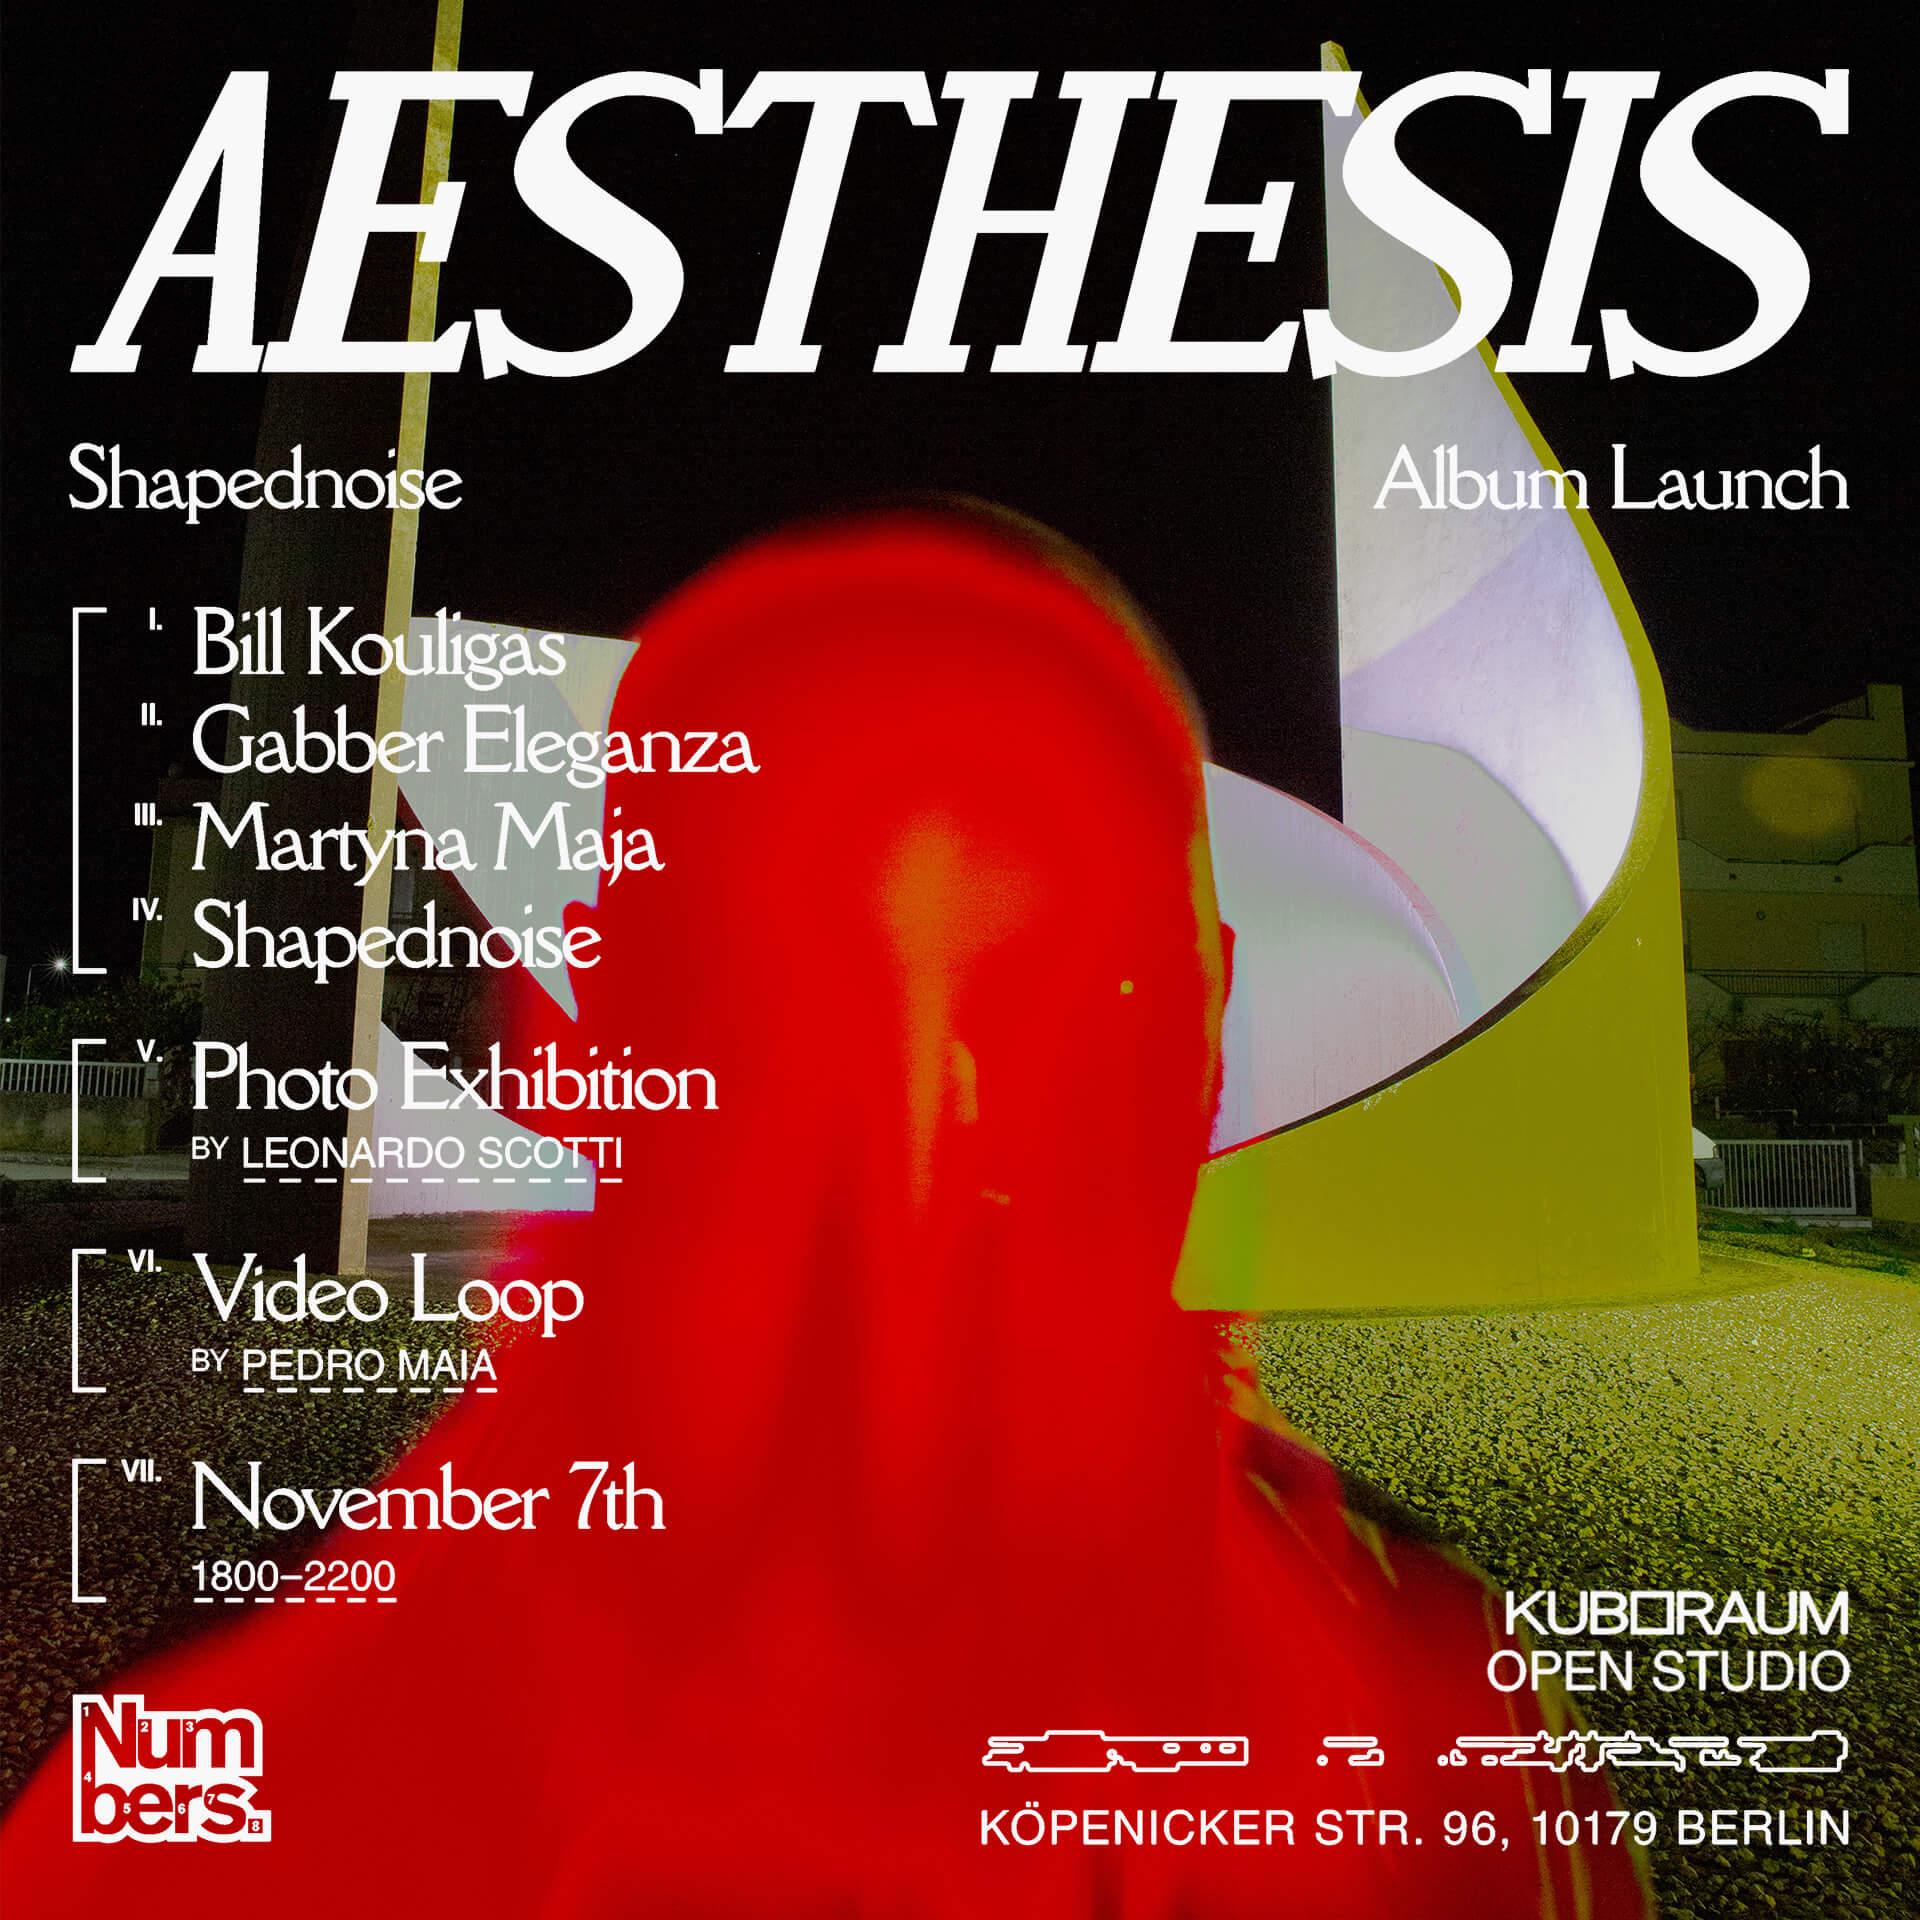 SHAPEDNOISE 'AESTHESIS' ALBUM LAUNCH